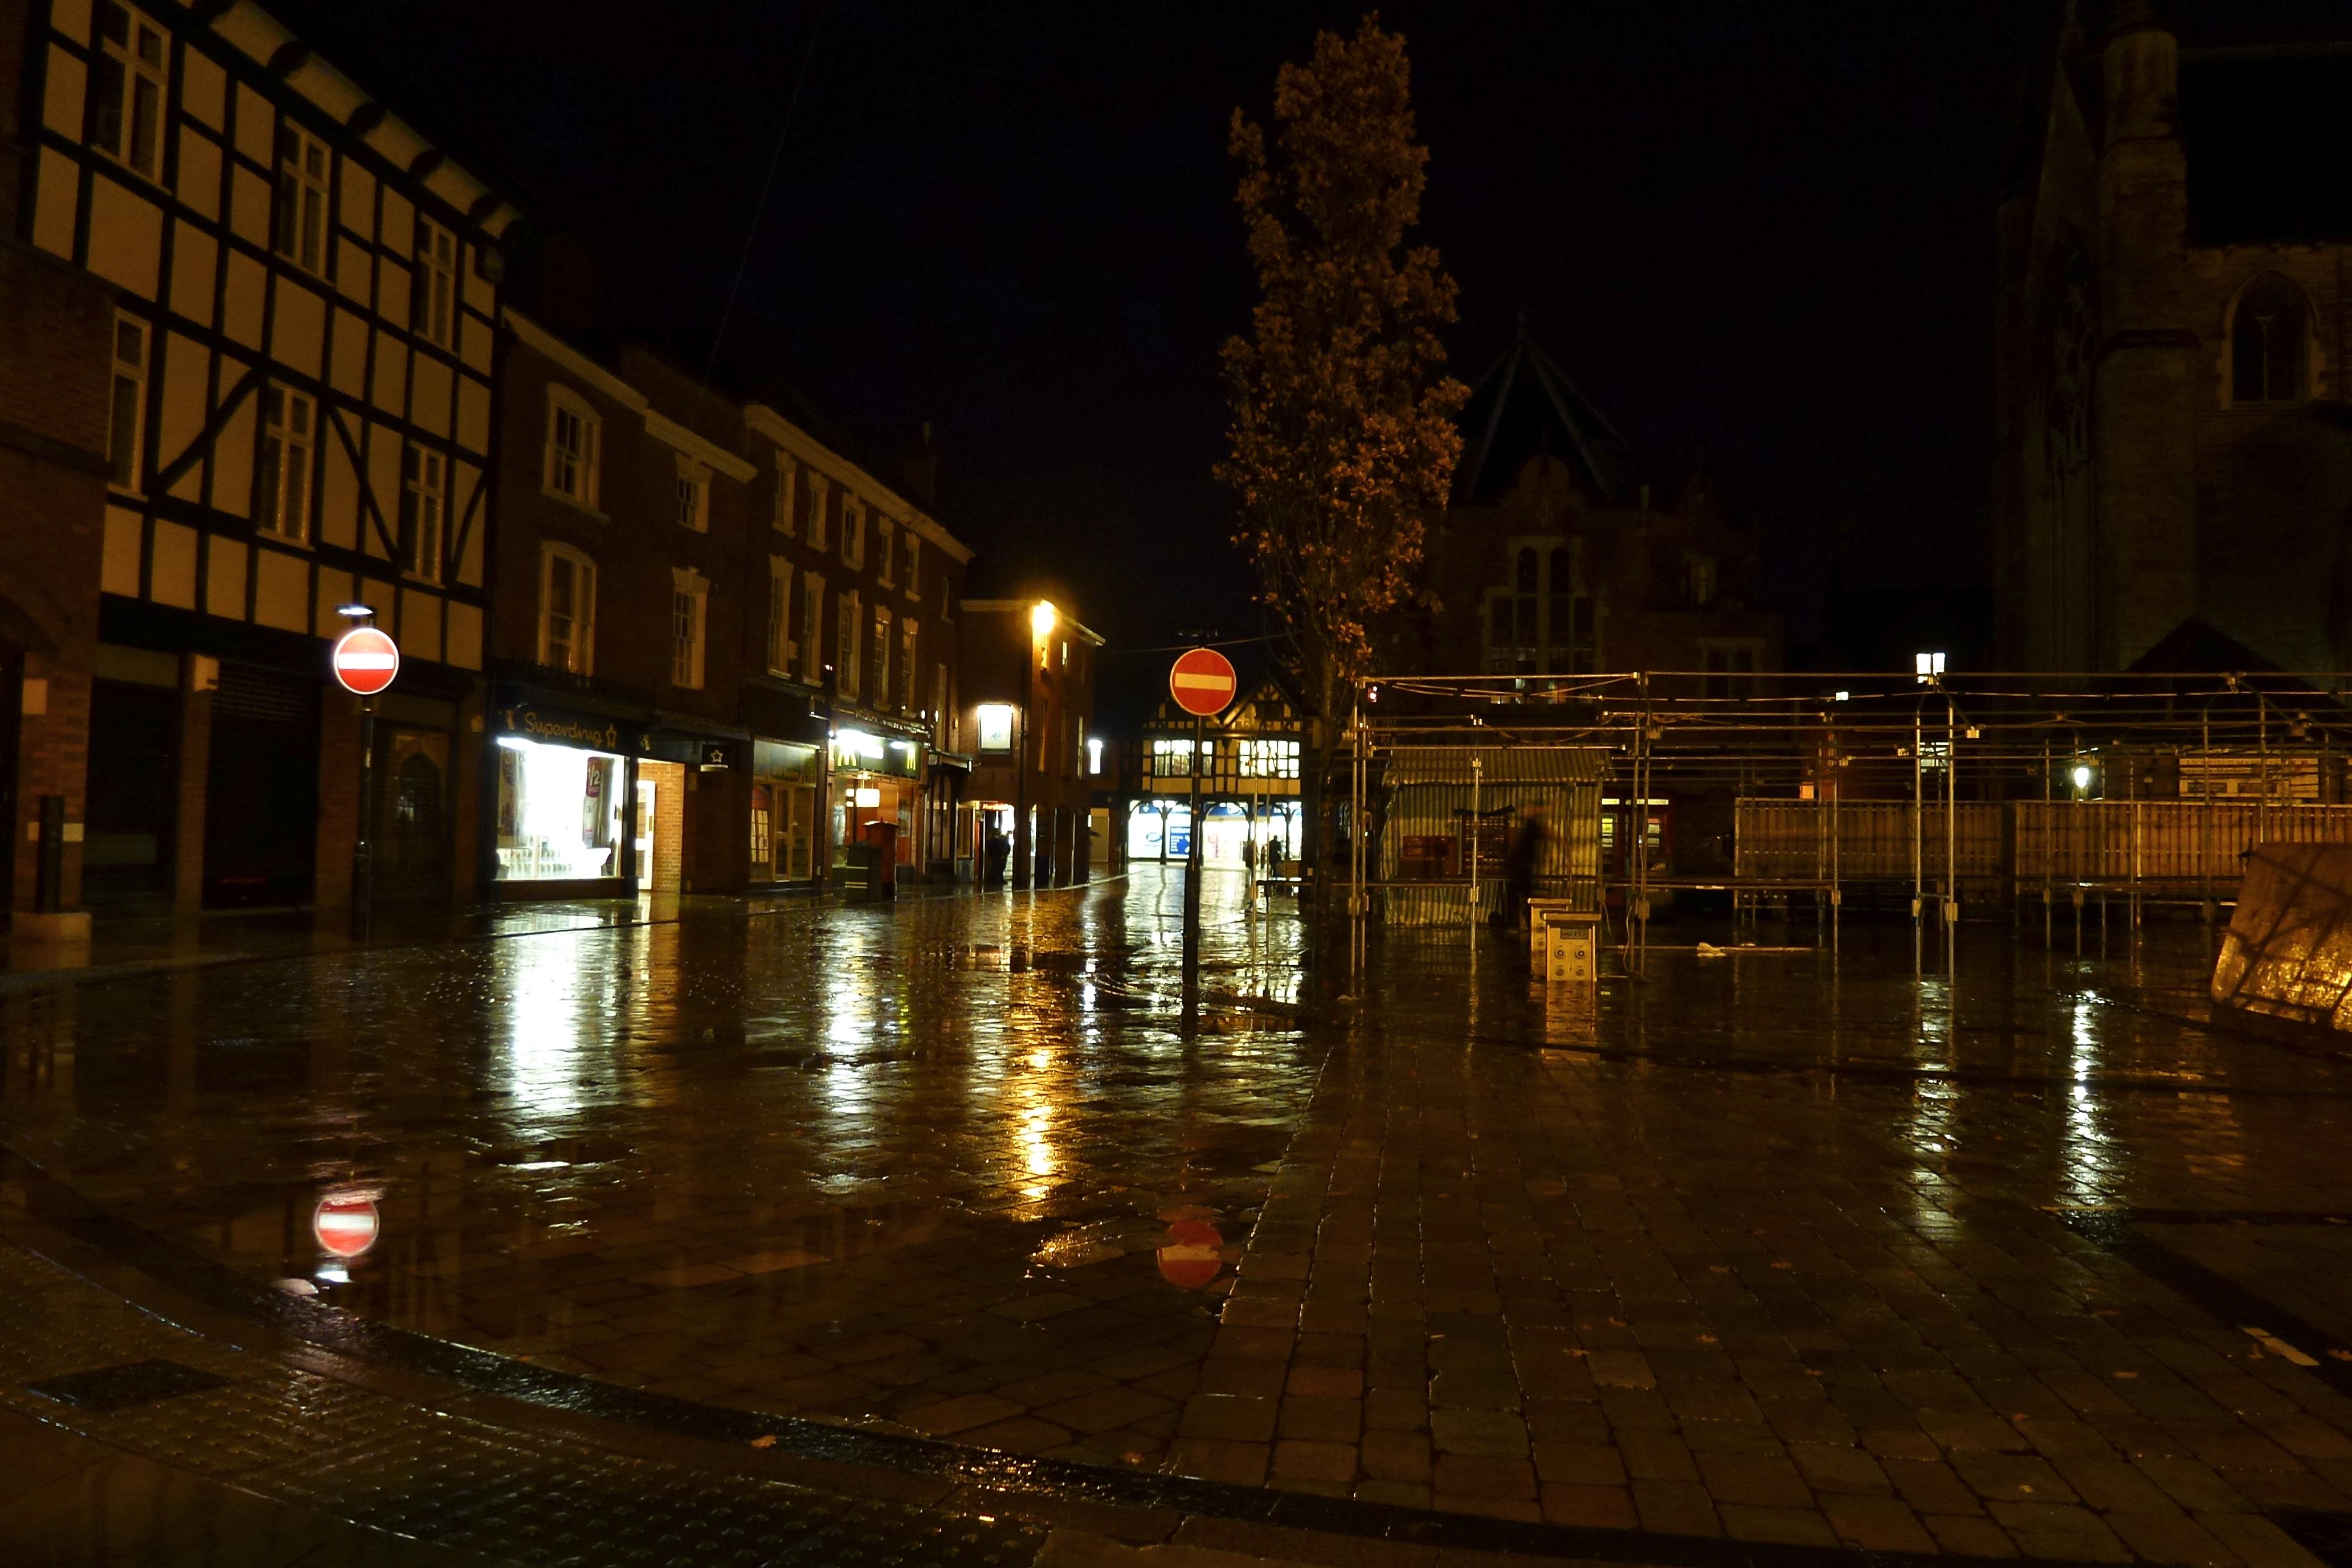 A rainy night in Lichfield | BrownhillsBob's Brownhills Blog